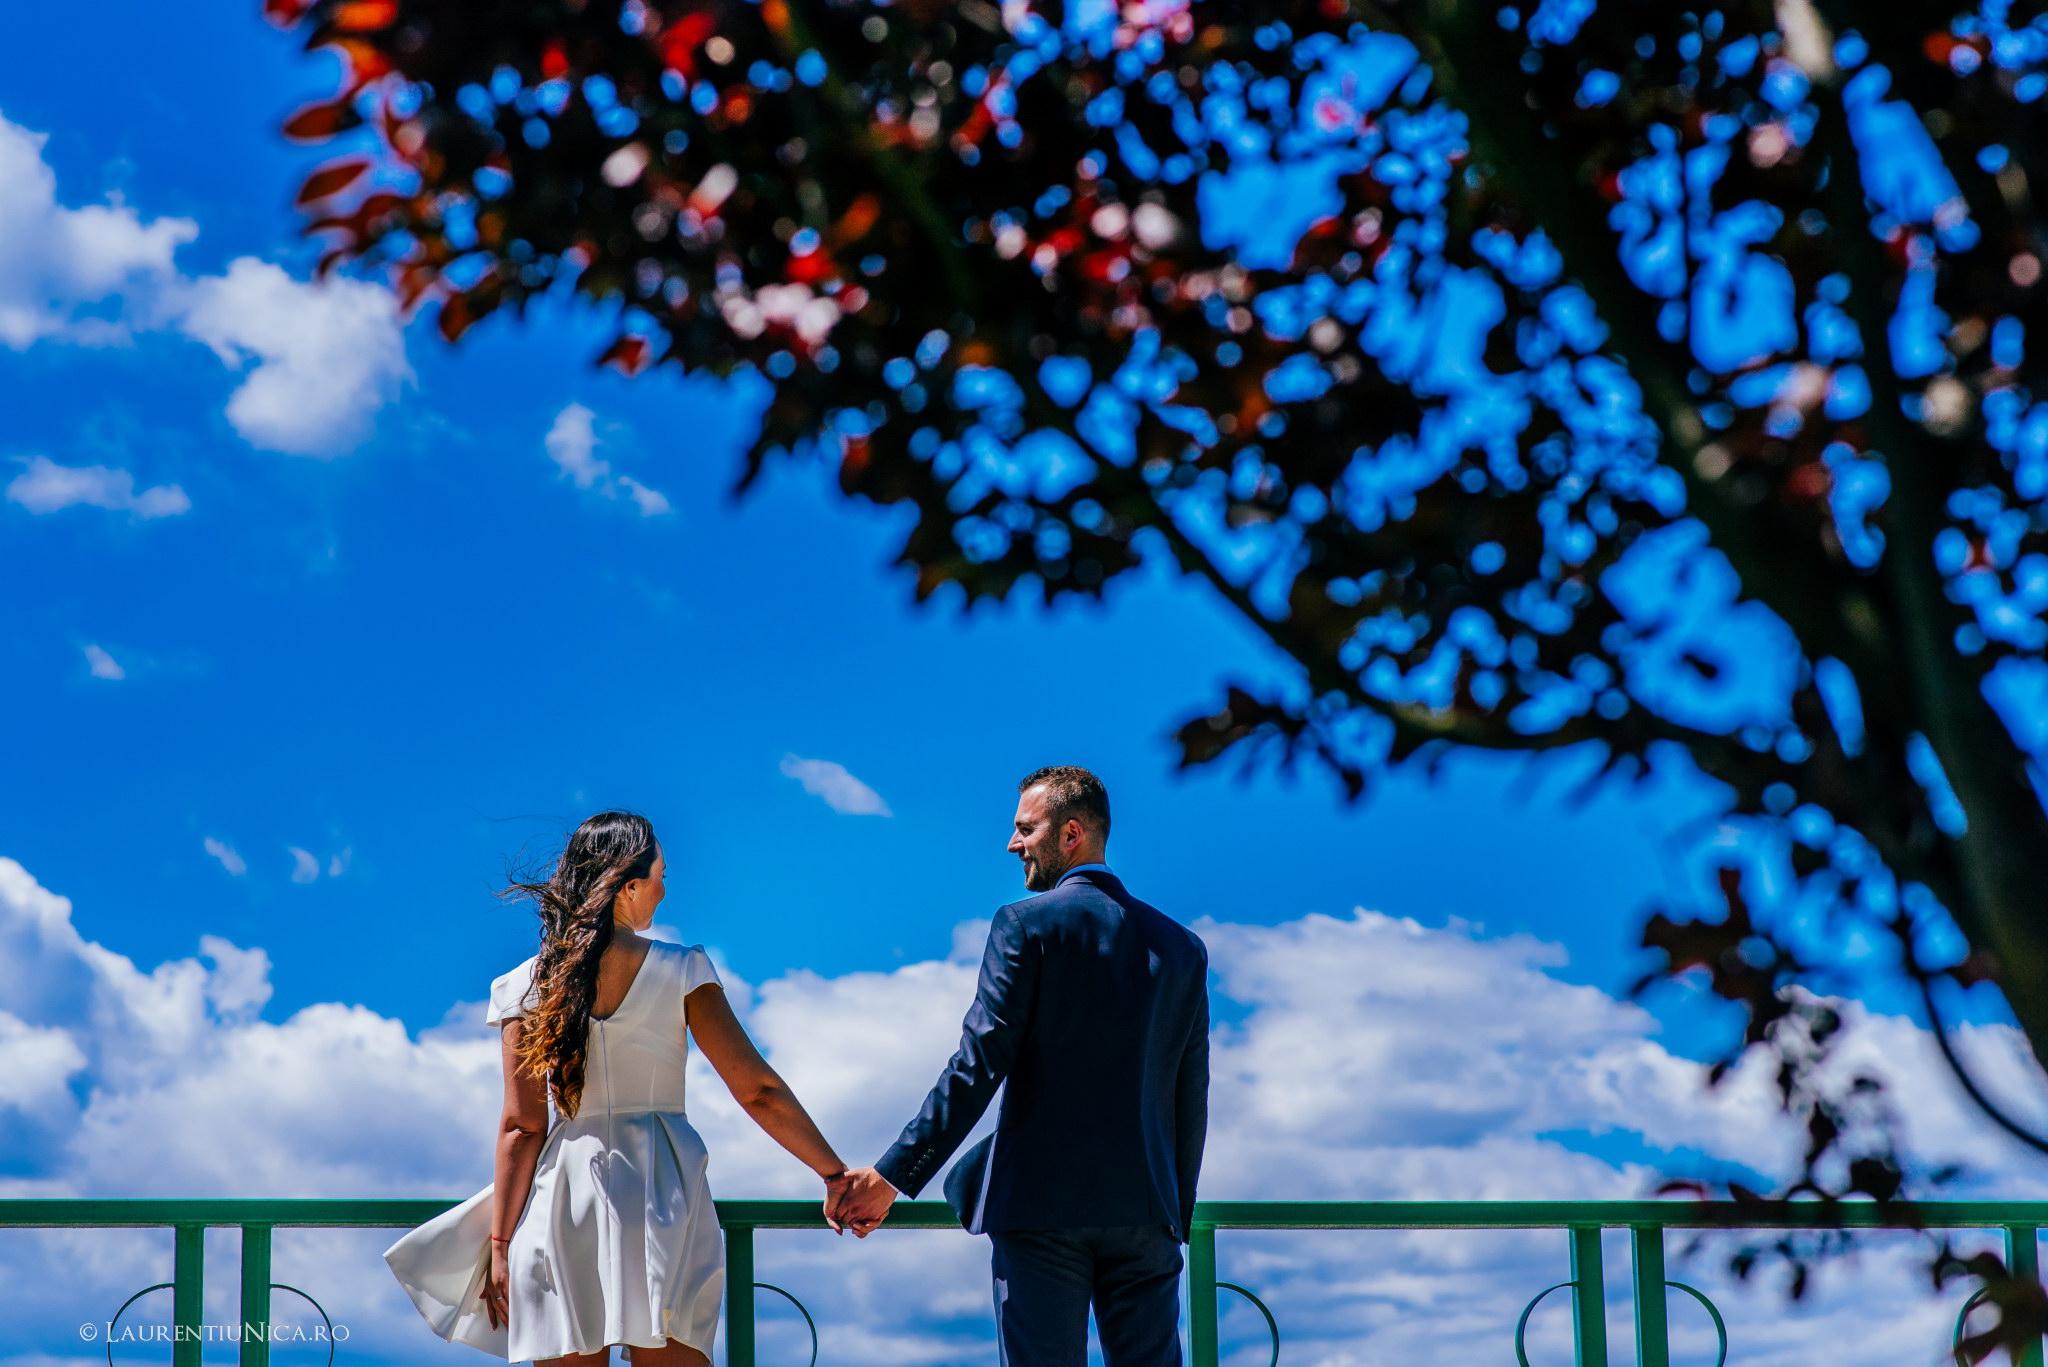 daiana si madalin fotograf nunta laurentiu nica targu jiu gorj 05 - Daiana & Madalin | Fotografii nunta | Targu-Jiu | Gorj